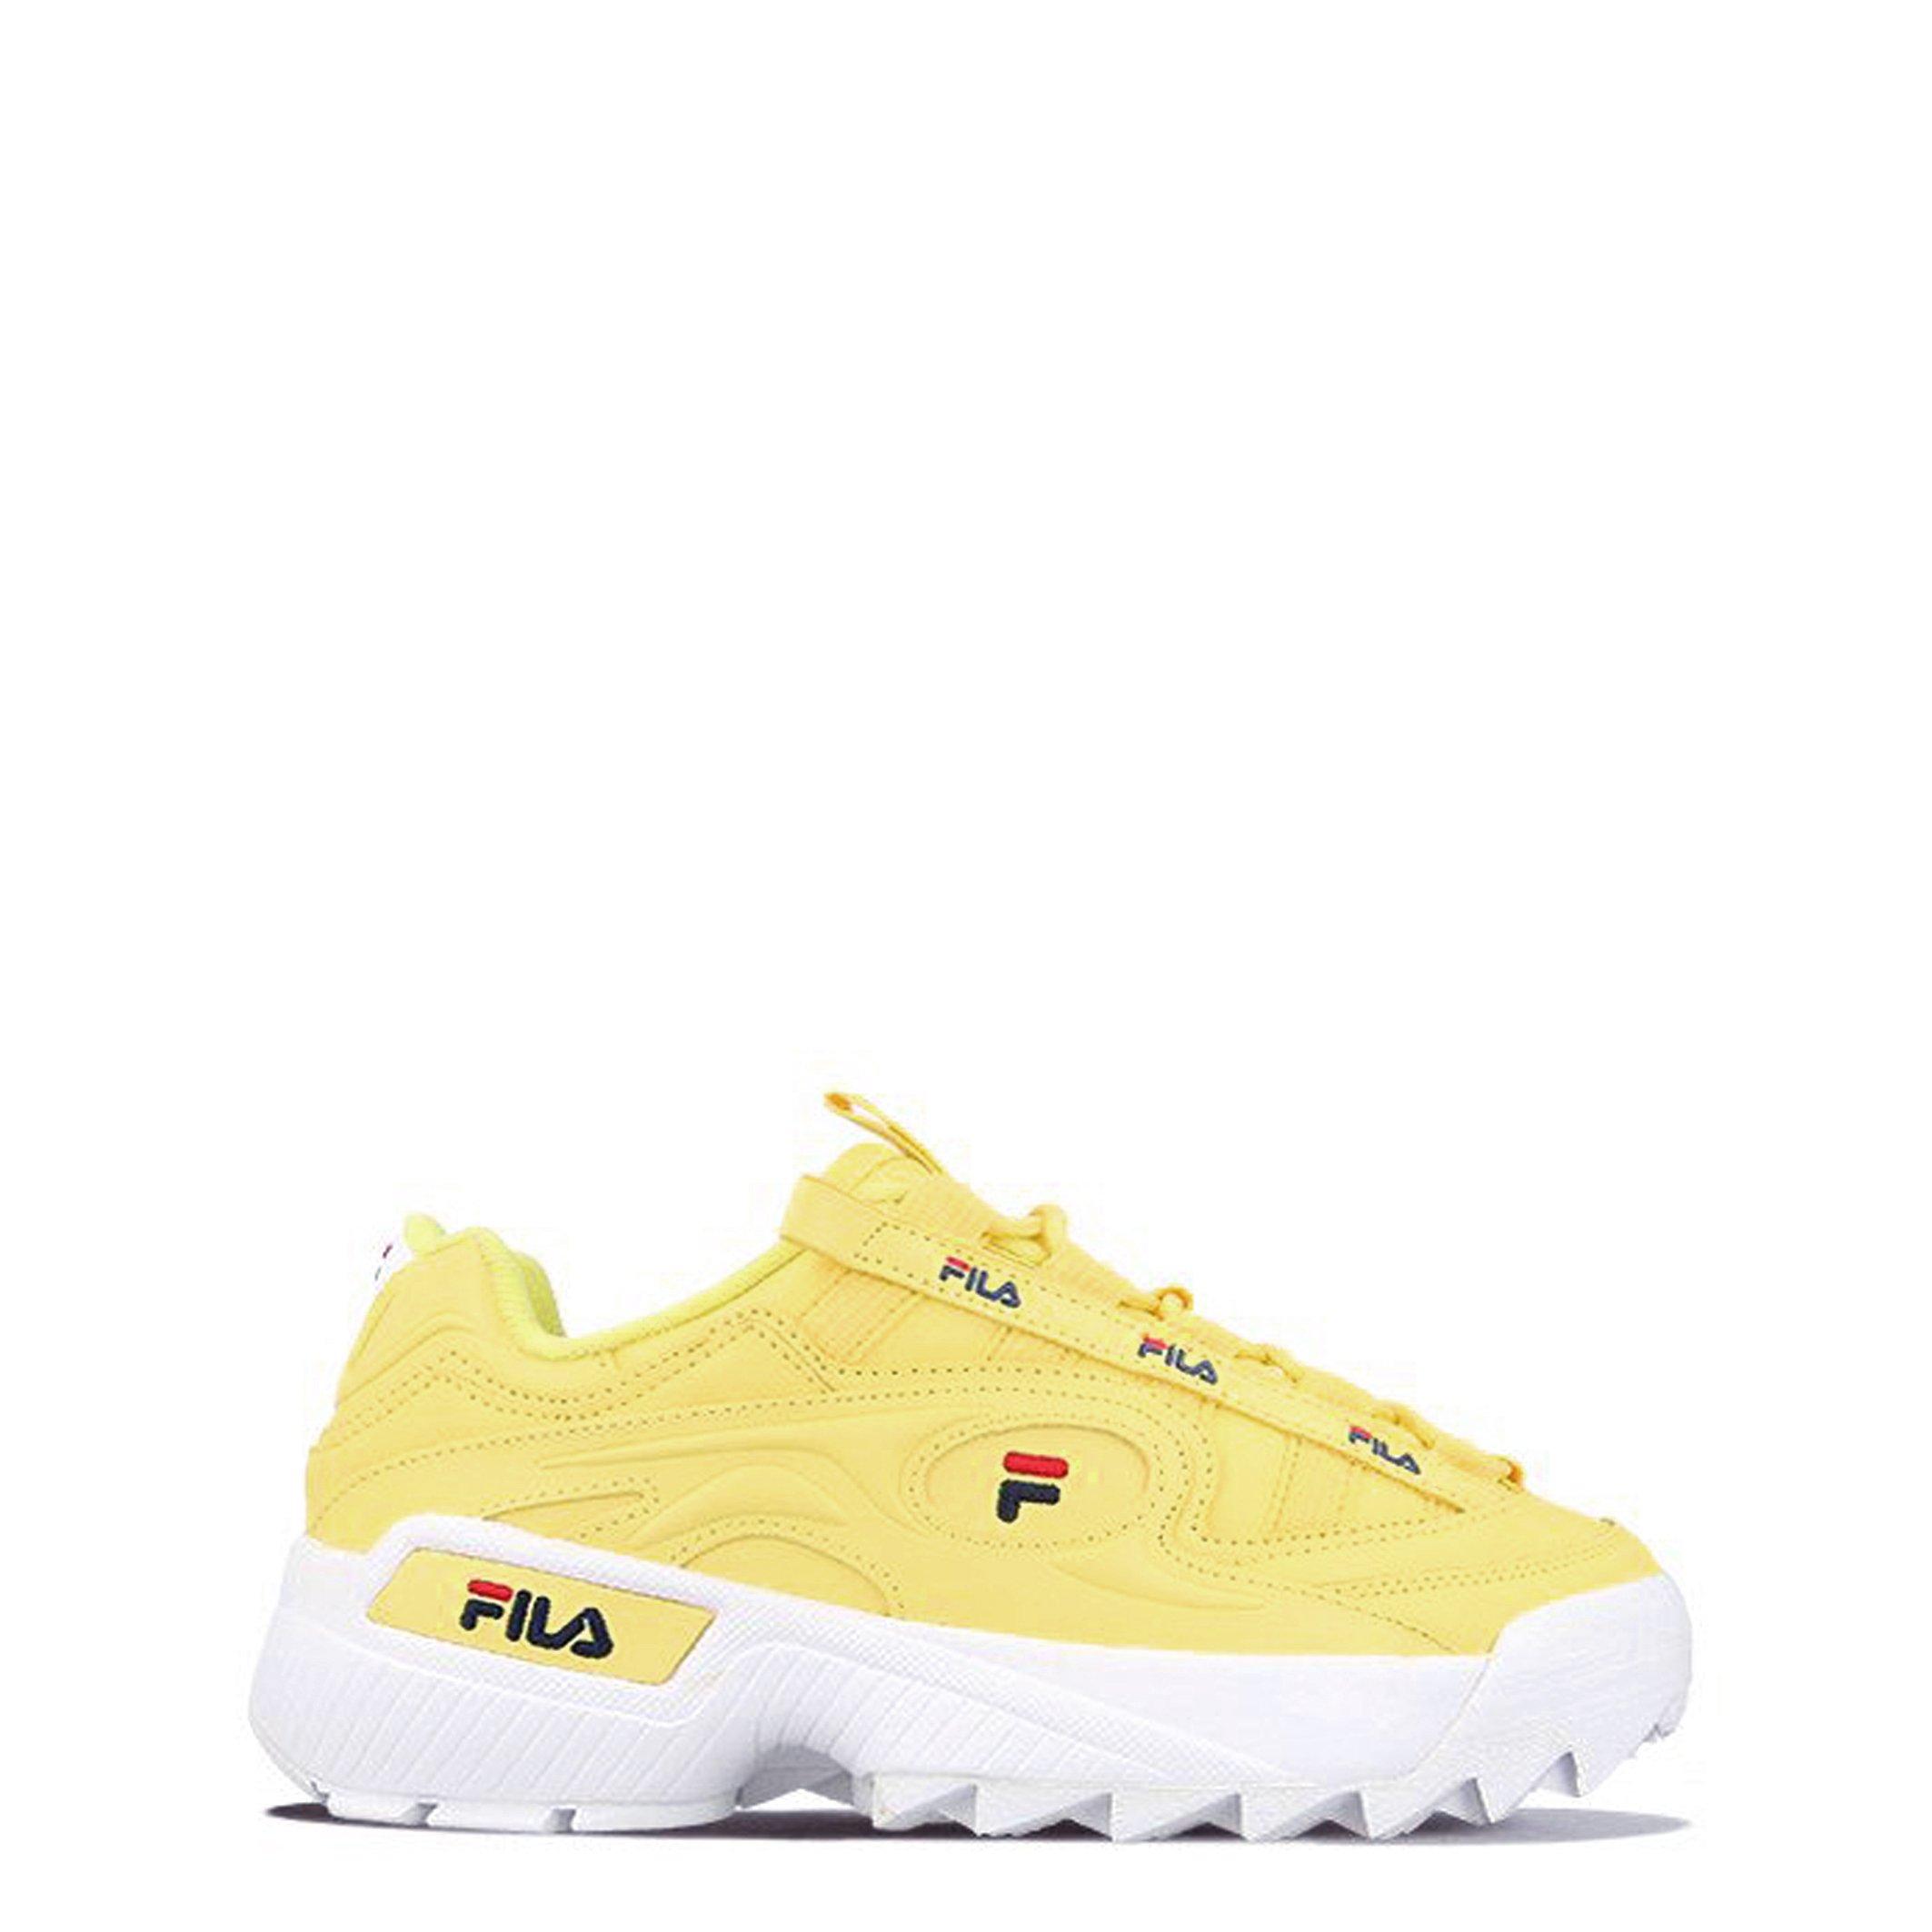 Fila Women's Trainer Various Colours D-FORMATION-W_1010856 - yellow EU 36